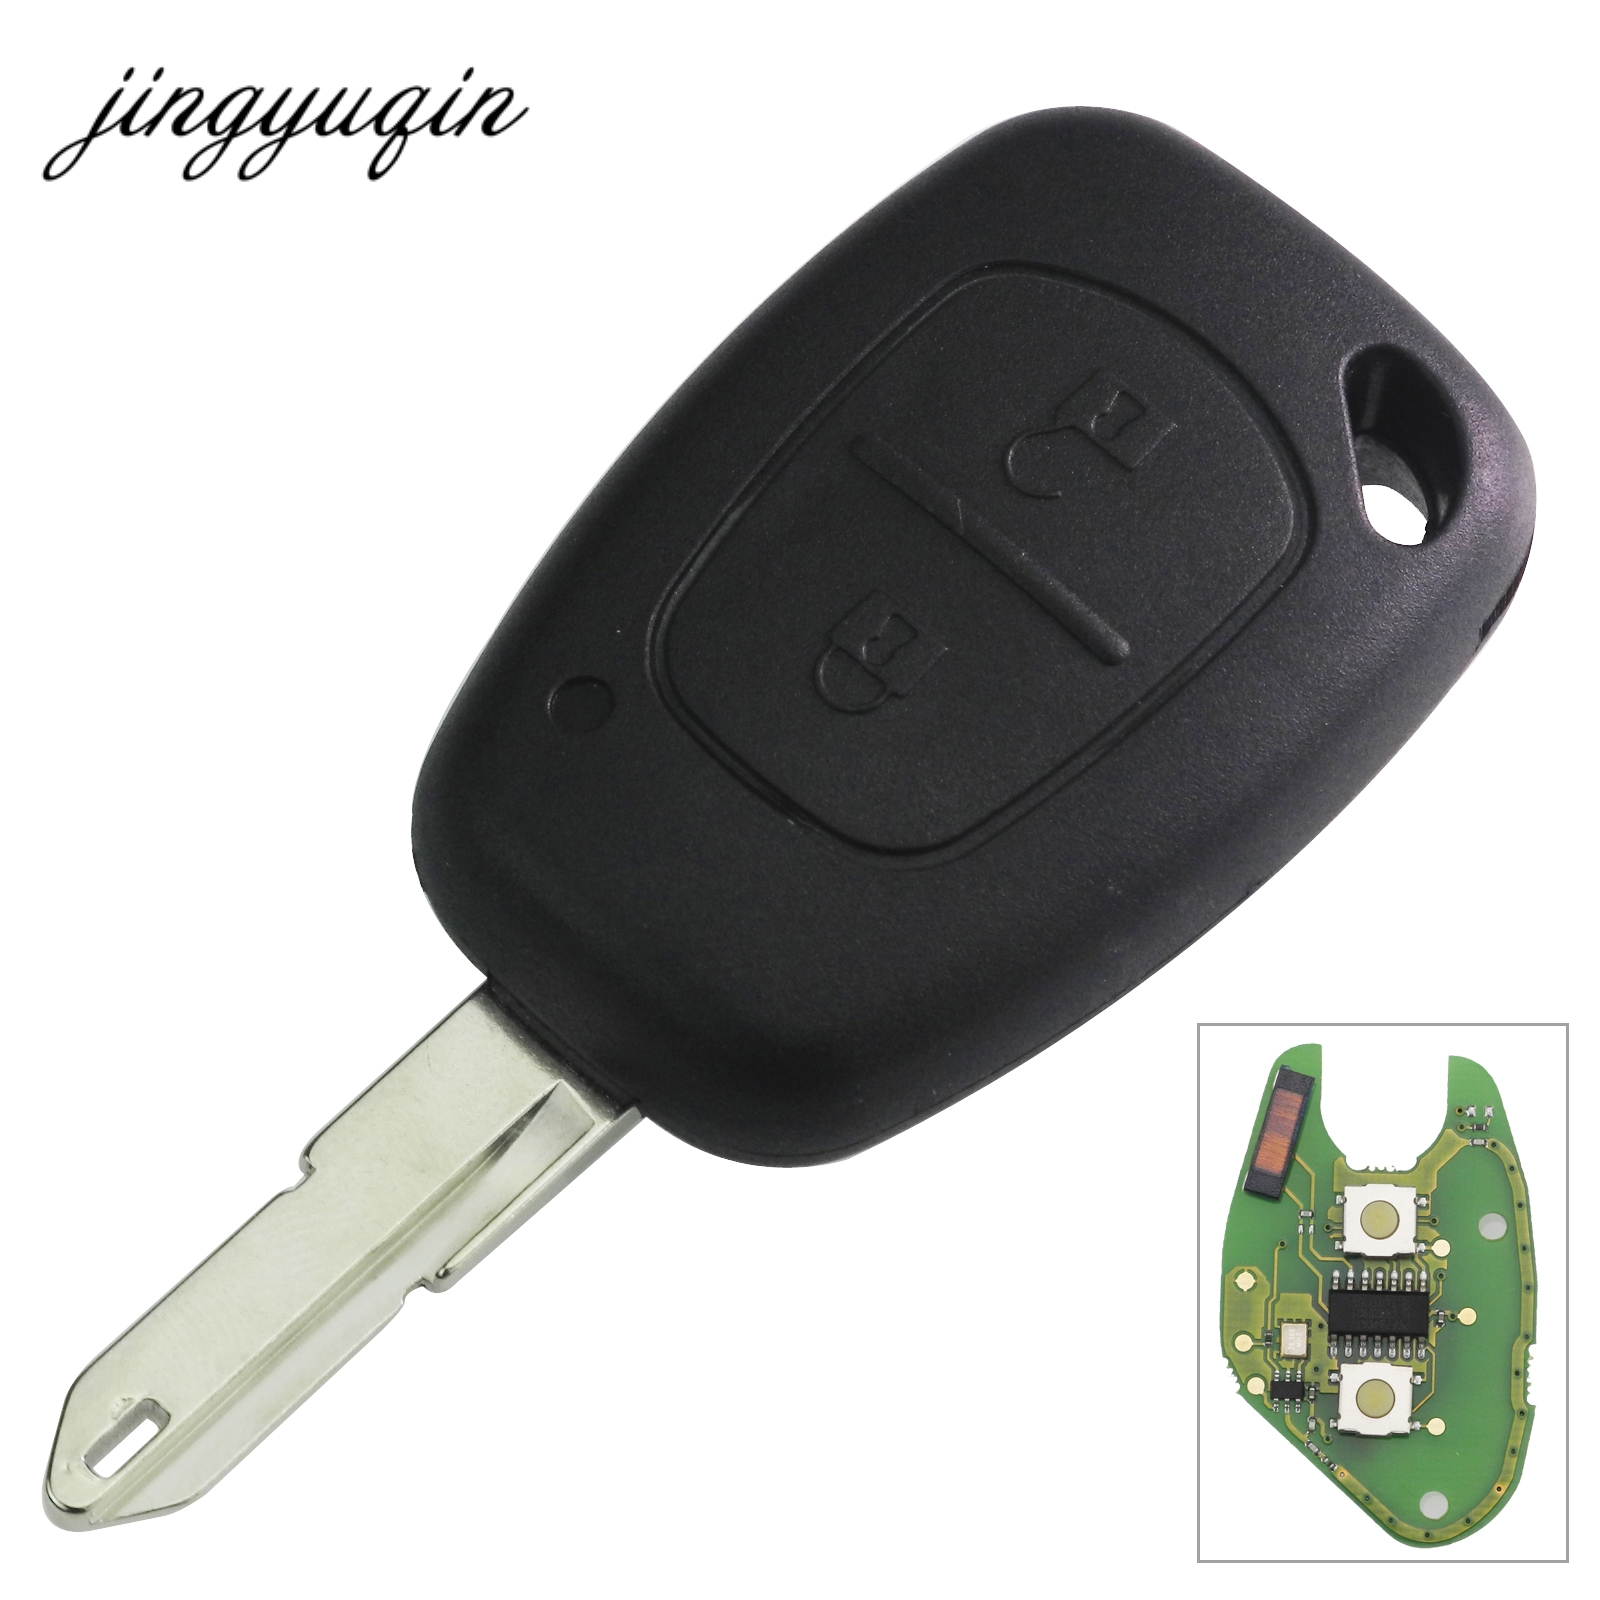 Jingyuqin 2 Taste Auto Komplette Fern Schlüssel + ID46 Chip Transmister für Renault Traffic Master Vivaro Movano Kangoo Ne73 Klinge